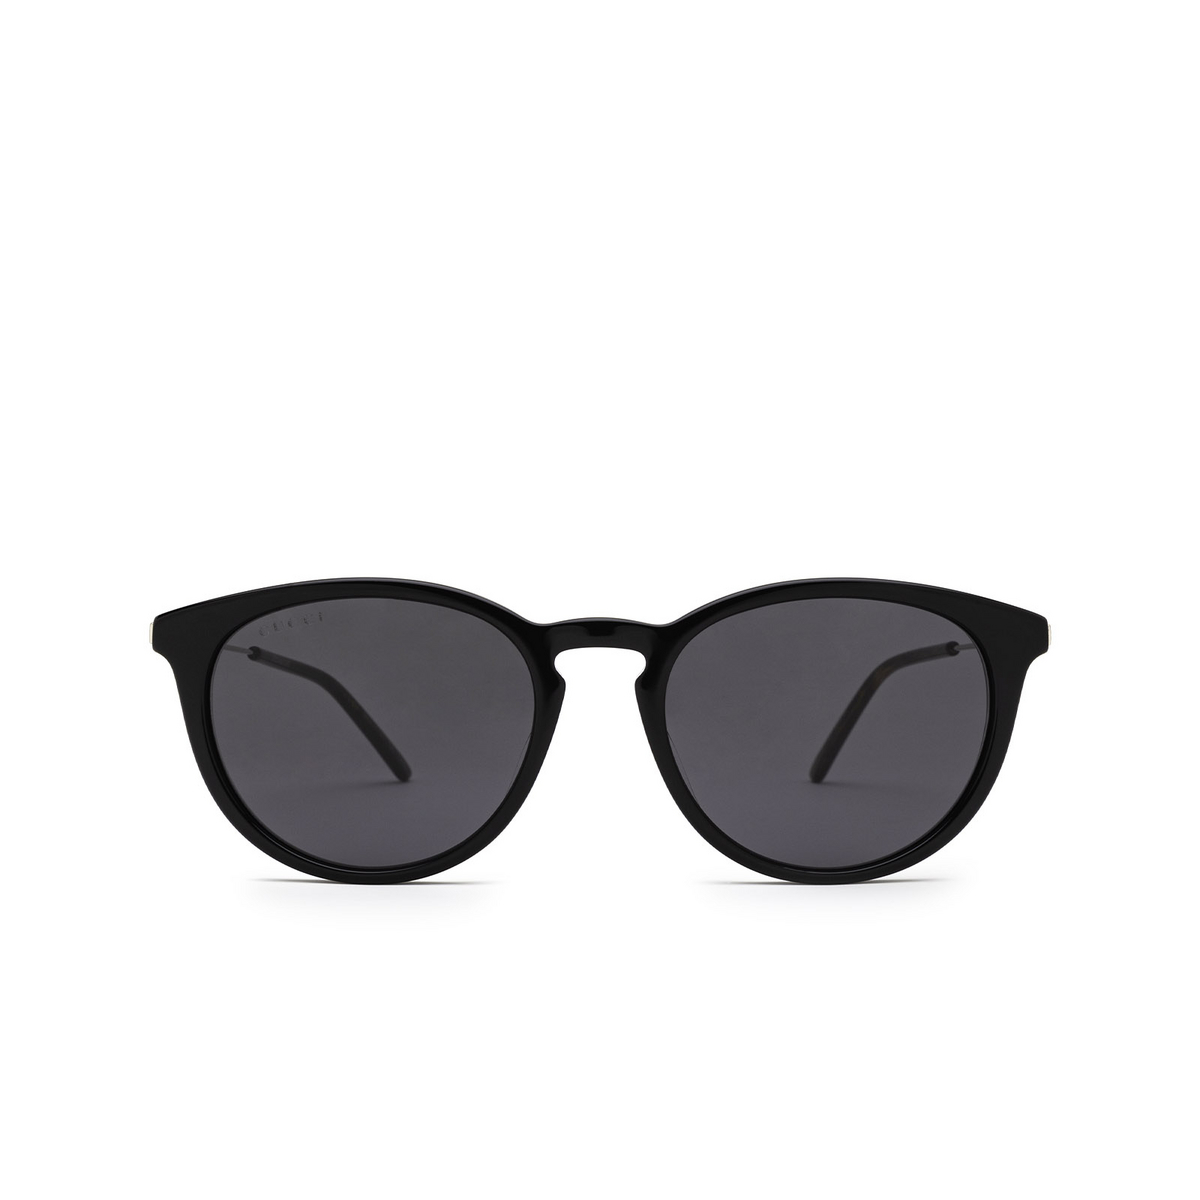 Gucci® Round Sunglasses: GG1048S color Black 001 - front view.